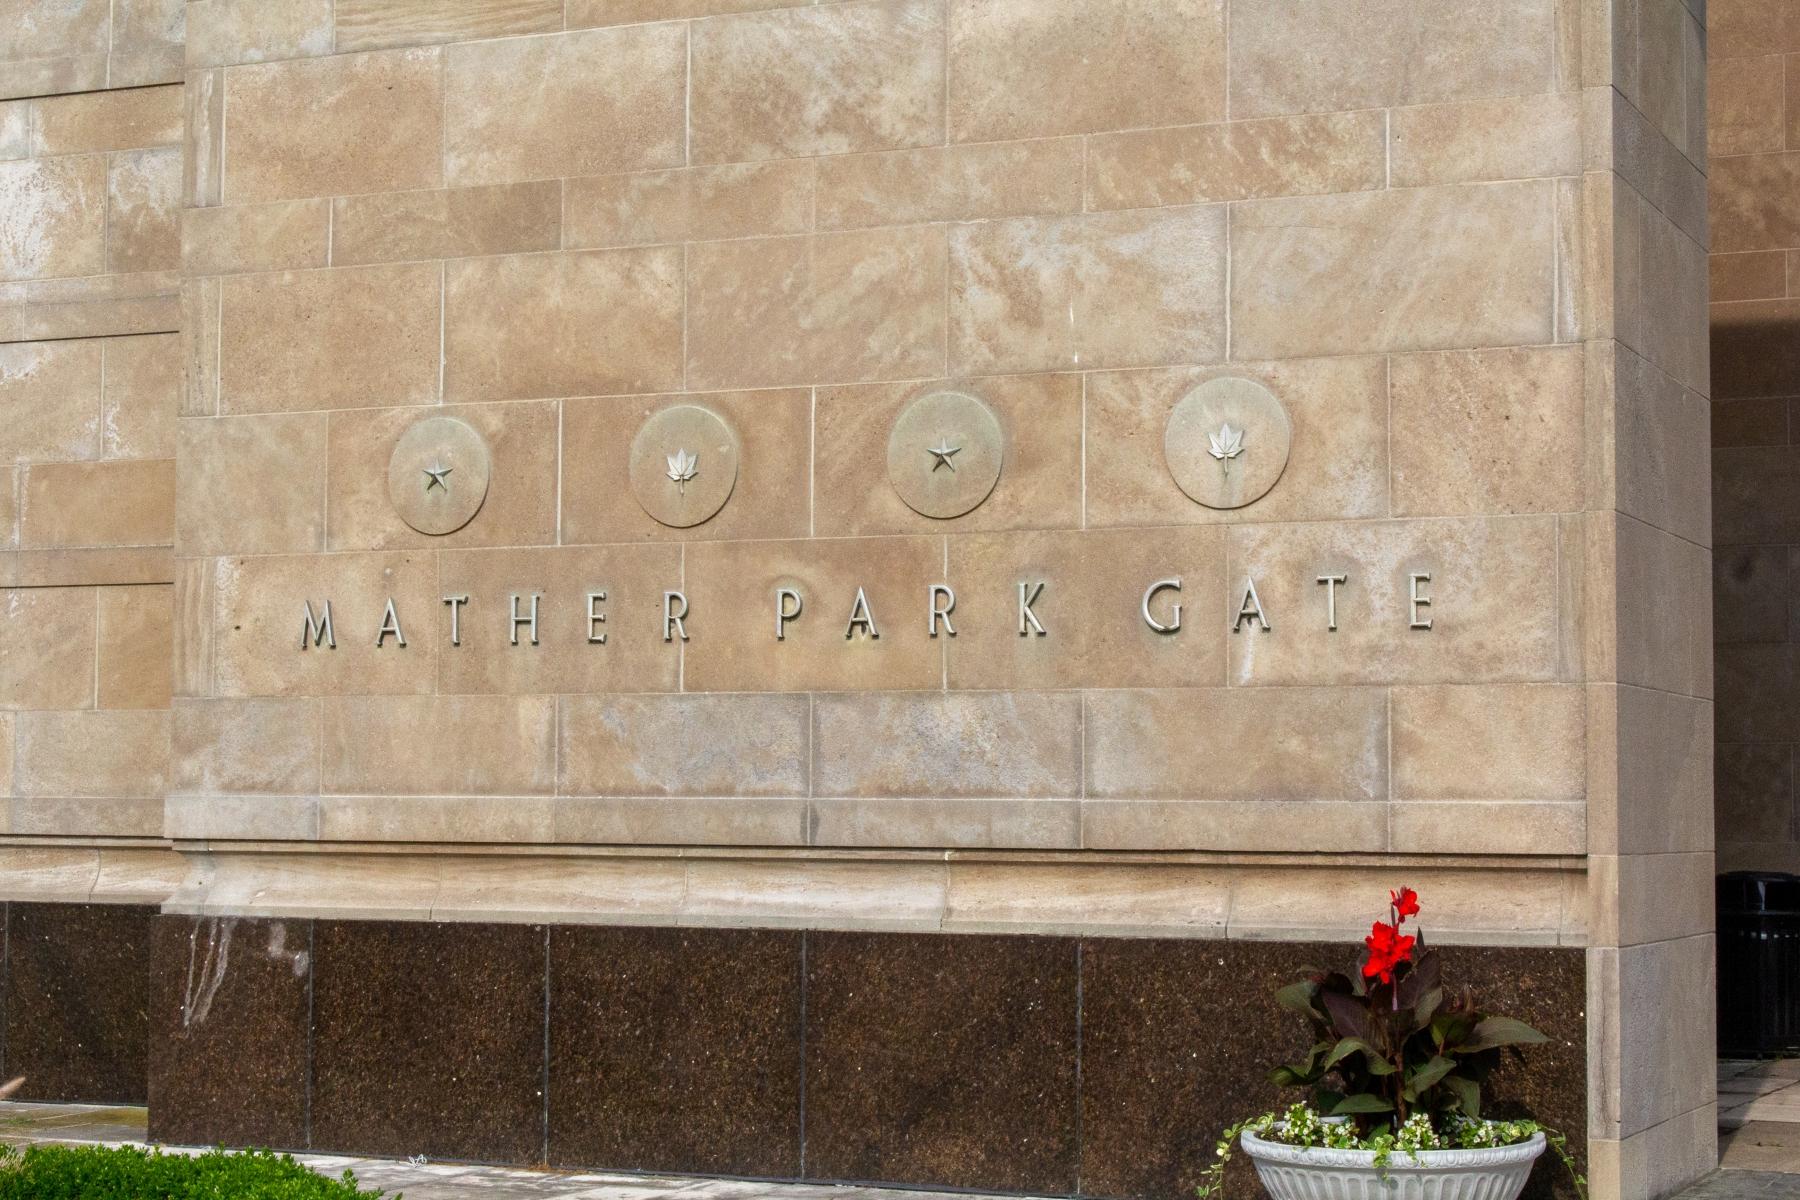 Mather park gate